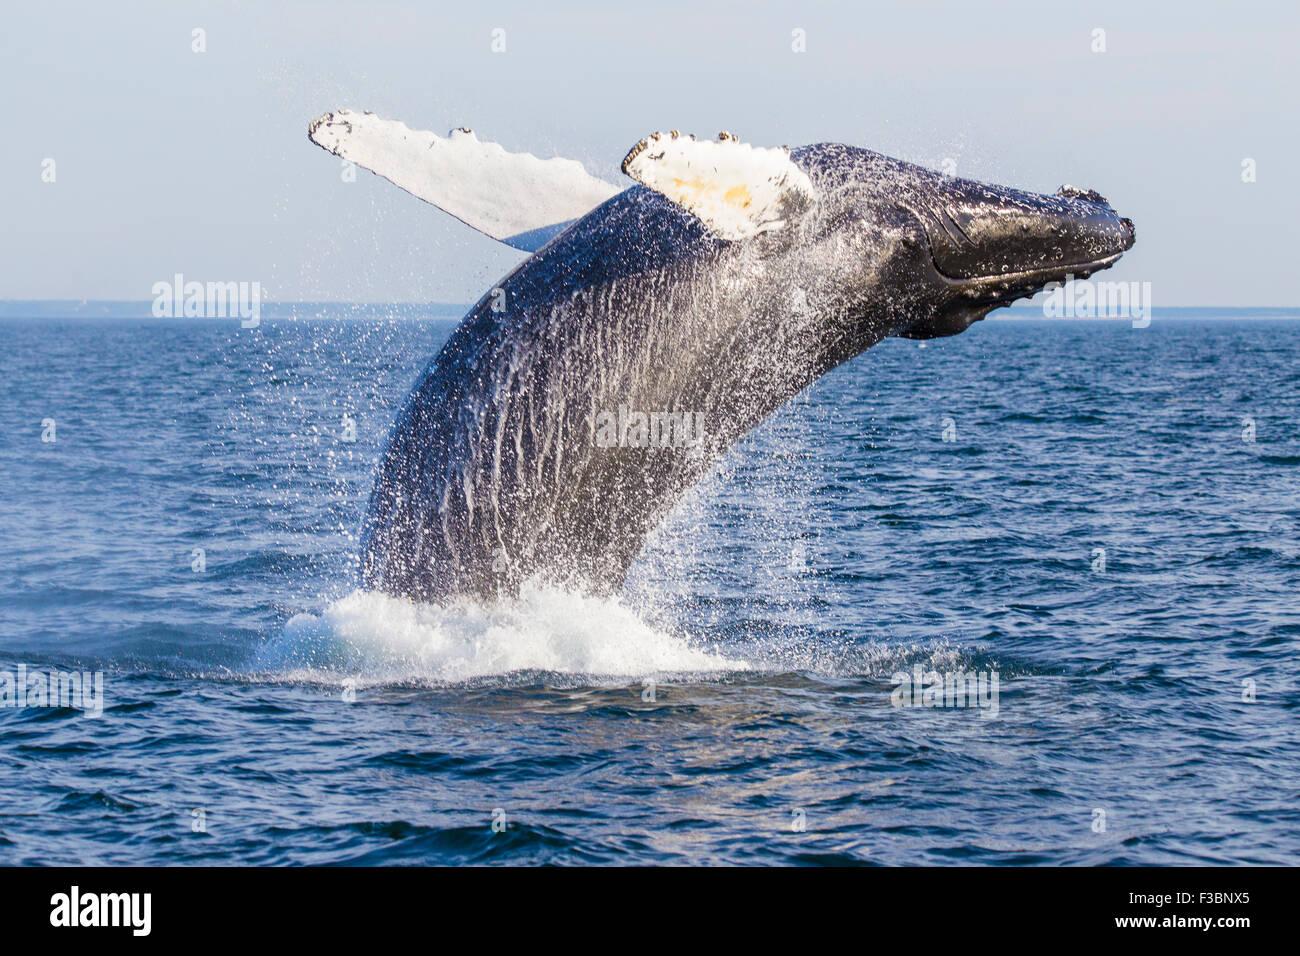 Humpback Whale (Megaptera novaeangliae) Breaching-Cape Cod, Massachusetts - Stock Image